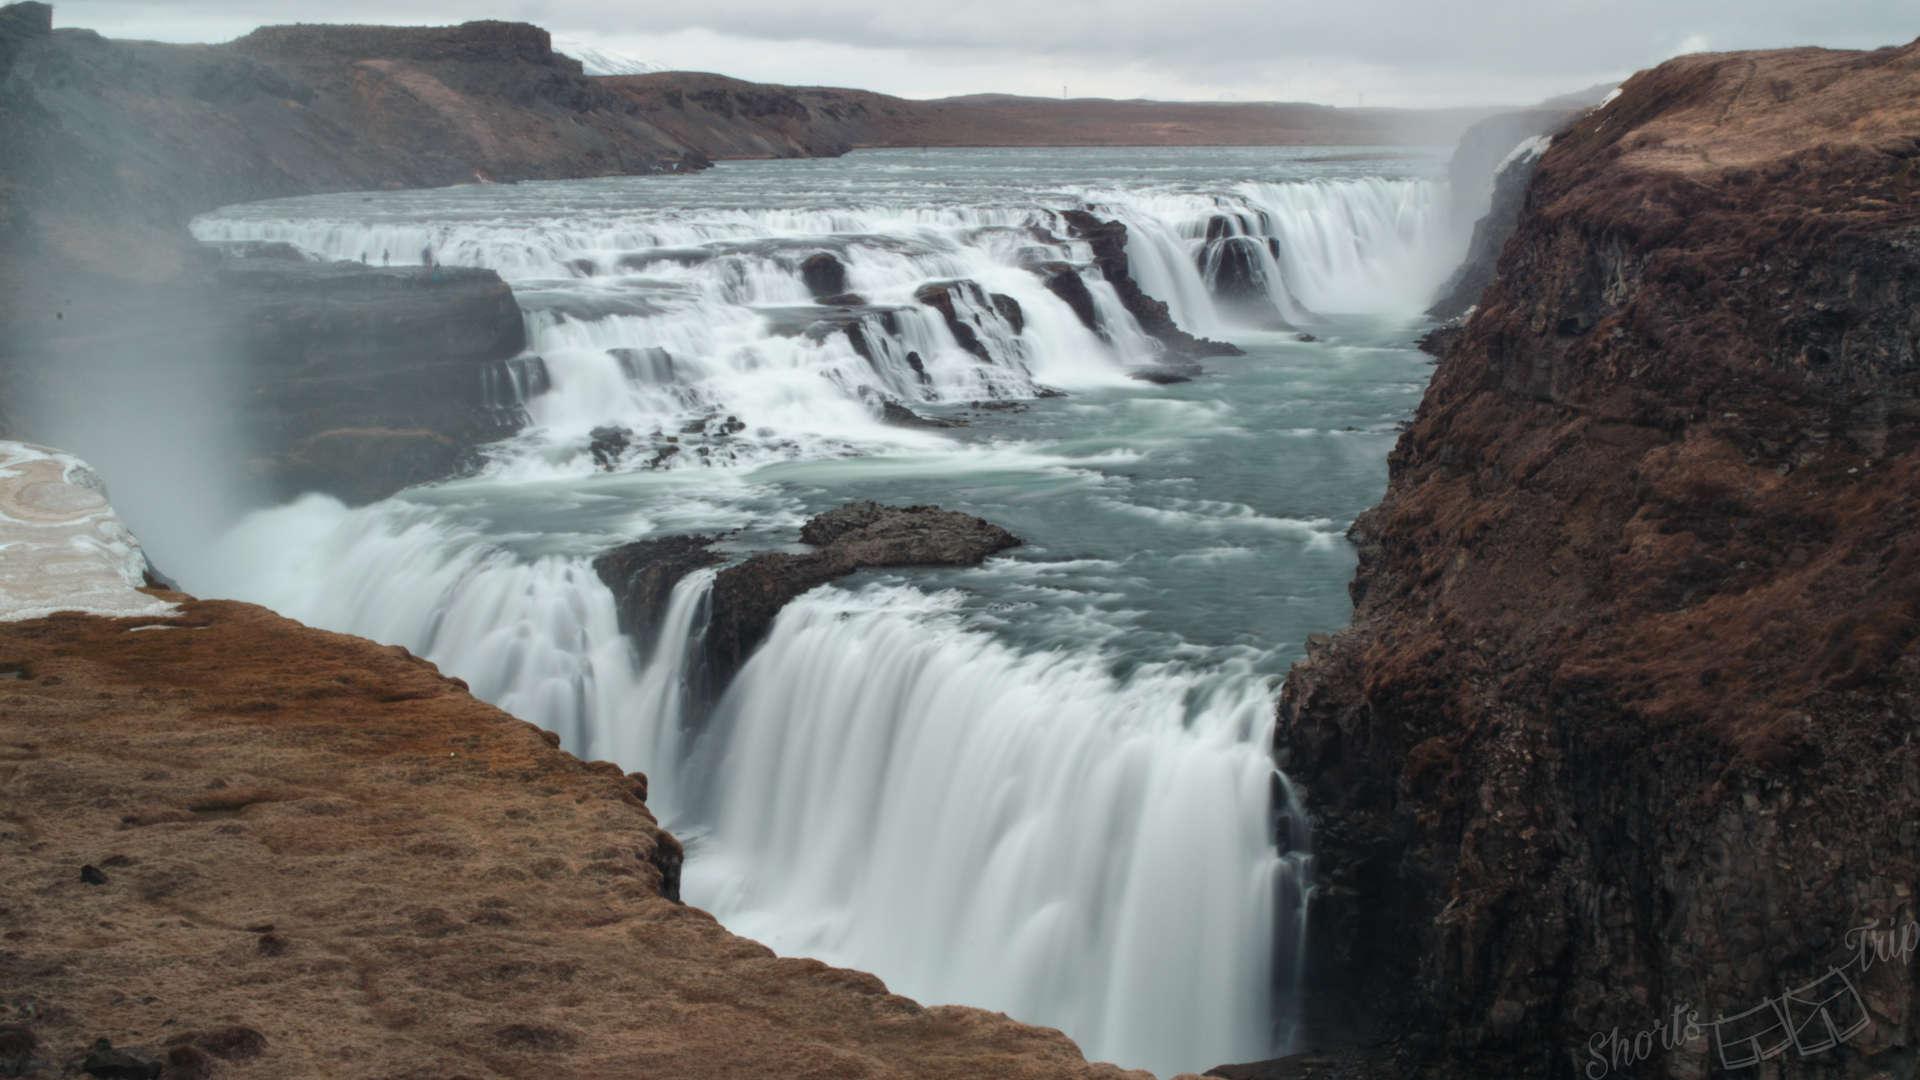 gulfoss waterfall, gulfoss long exposure